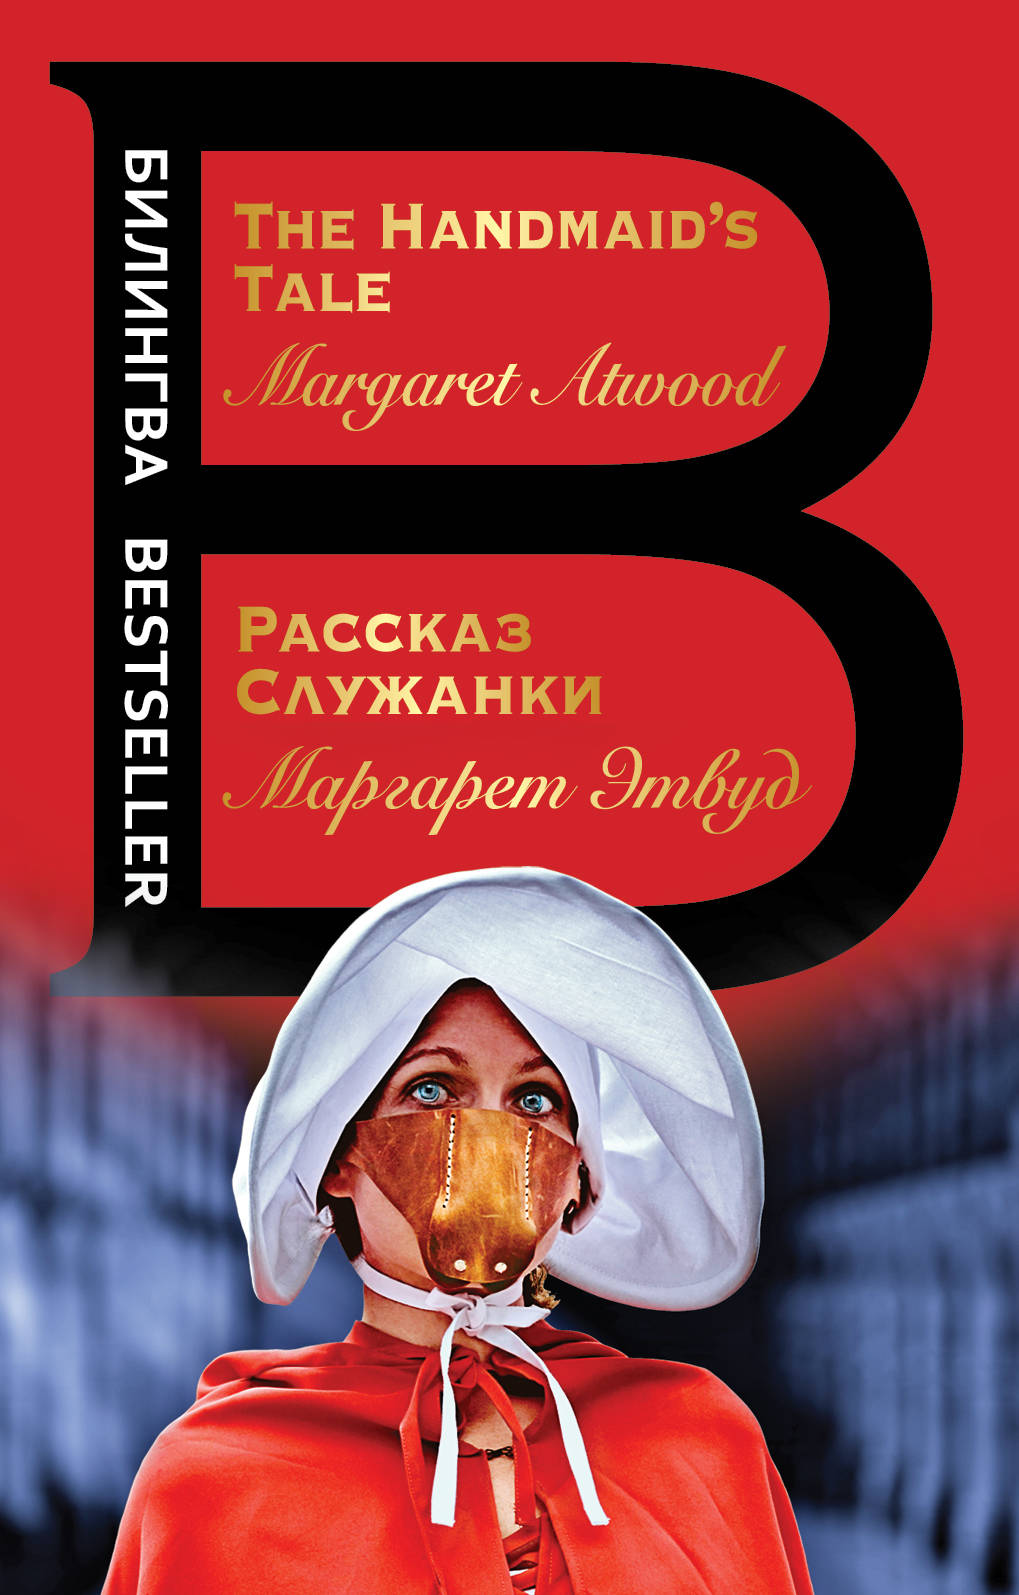 Rasskaz Sluzhanki. The Handmaid's Tale